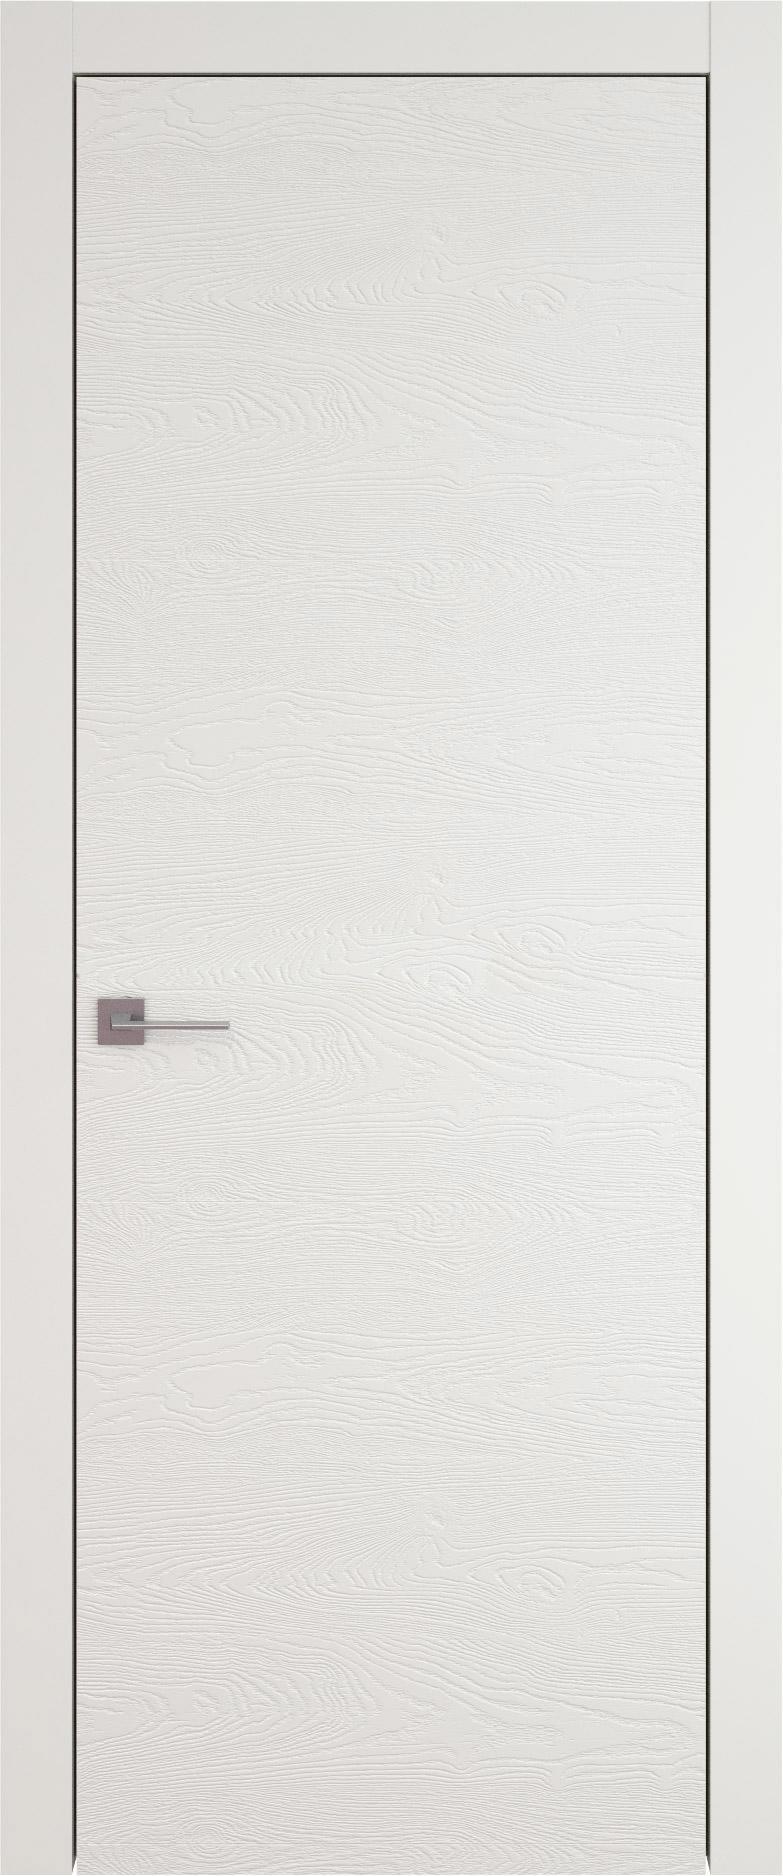 Tivoli А-2 цвет - Бежевая эмаль по шпону (RAL 9010) Без стекла (ДГ)